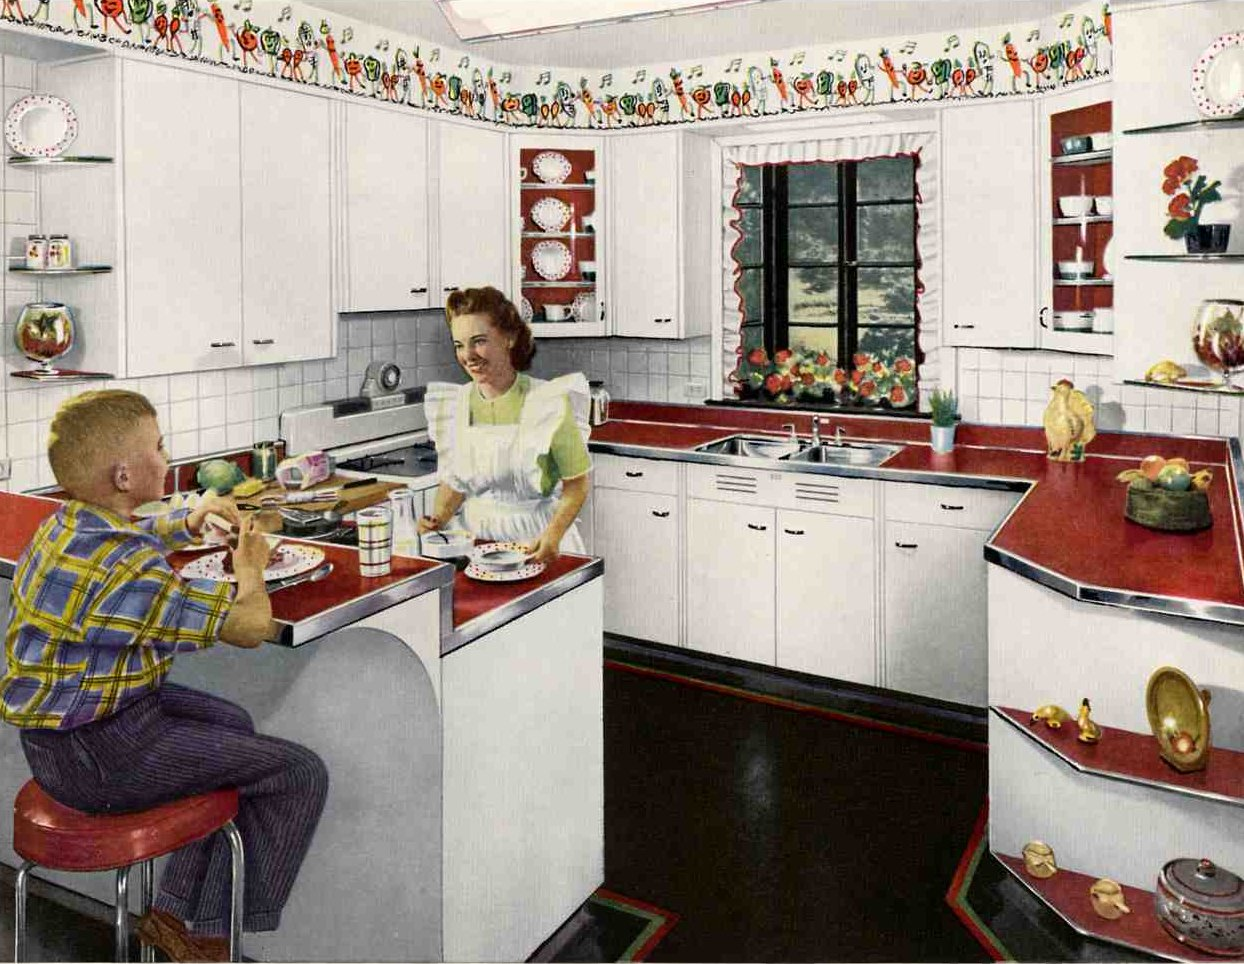 http://2.bp.blogspot.com/-8Z2rKZ3C1Iw/TlHIOIbyywI/AAAAAAAACs0/FXM22-axDHw/s1600/1948-st-charles-kitchen_4.jpg